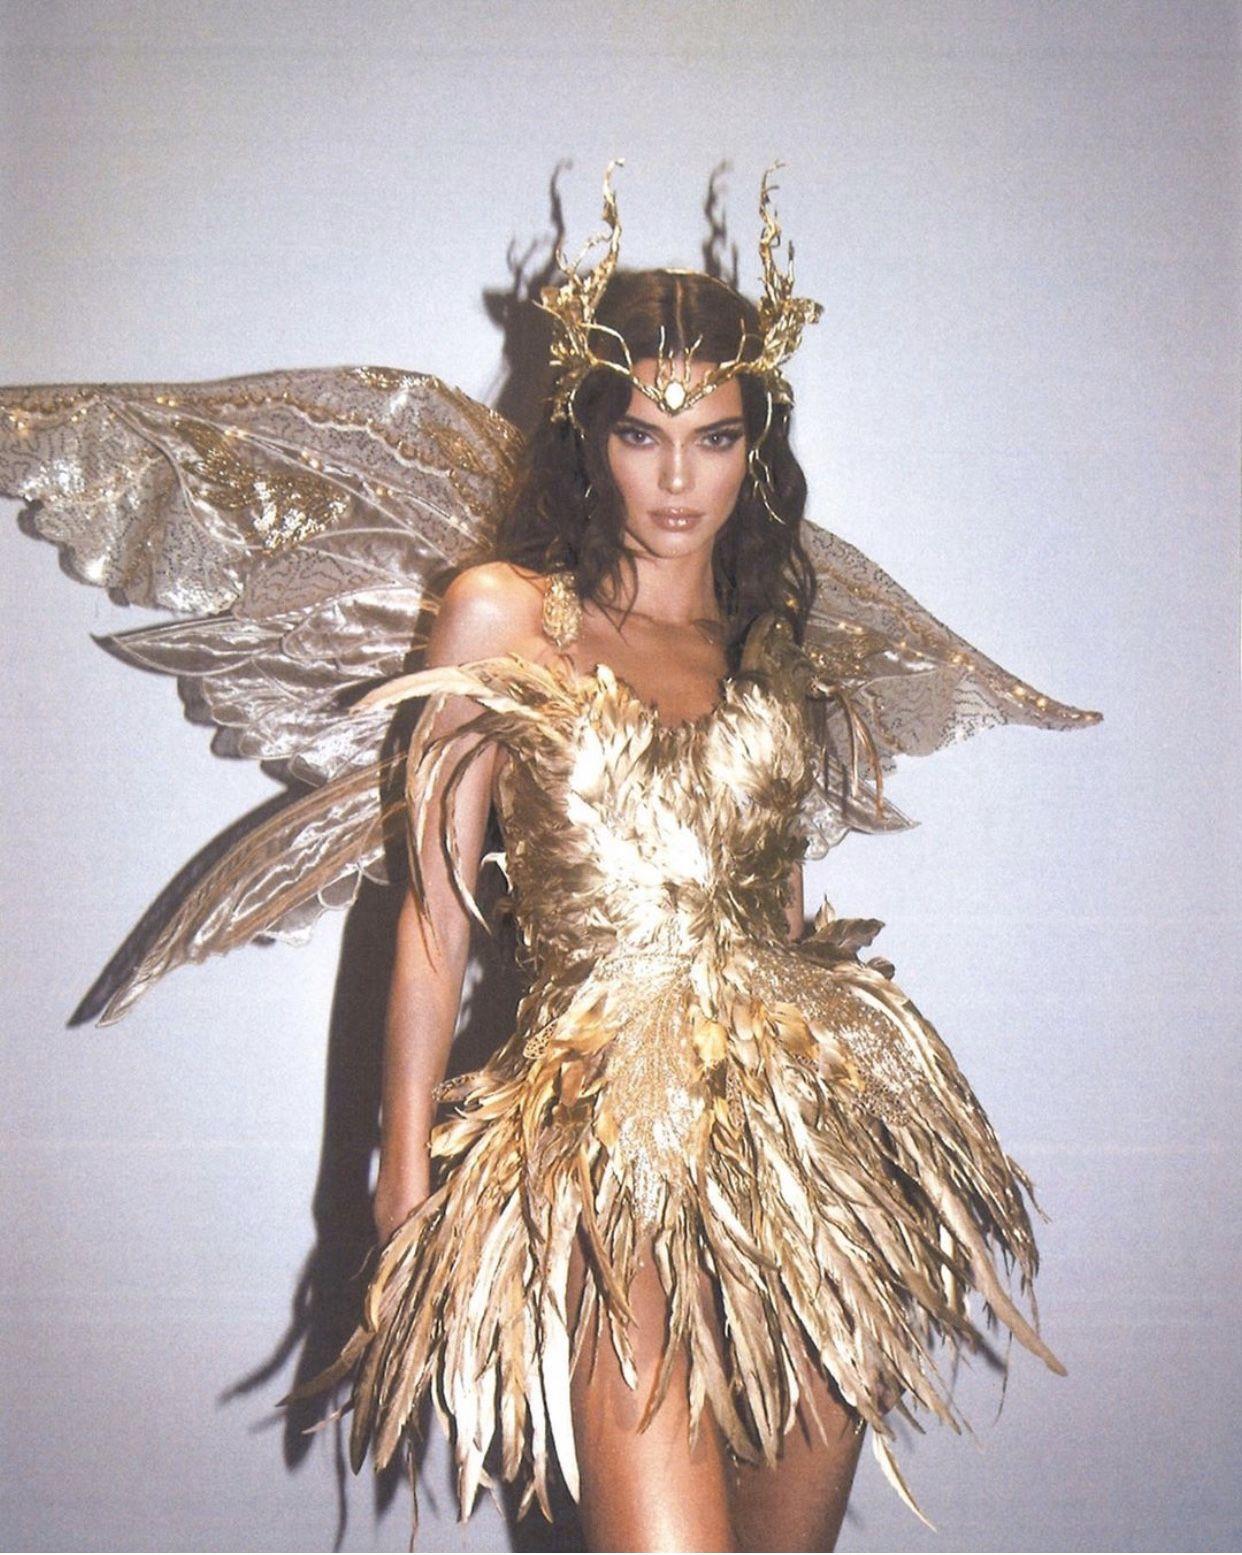 Kendall Jenner Halloween 2020 Kendall Jenner in 2020 | Kendall jenner halloween, Forest fairy